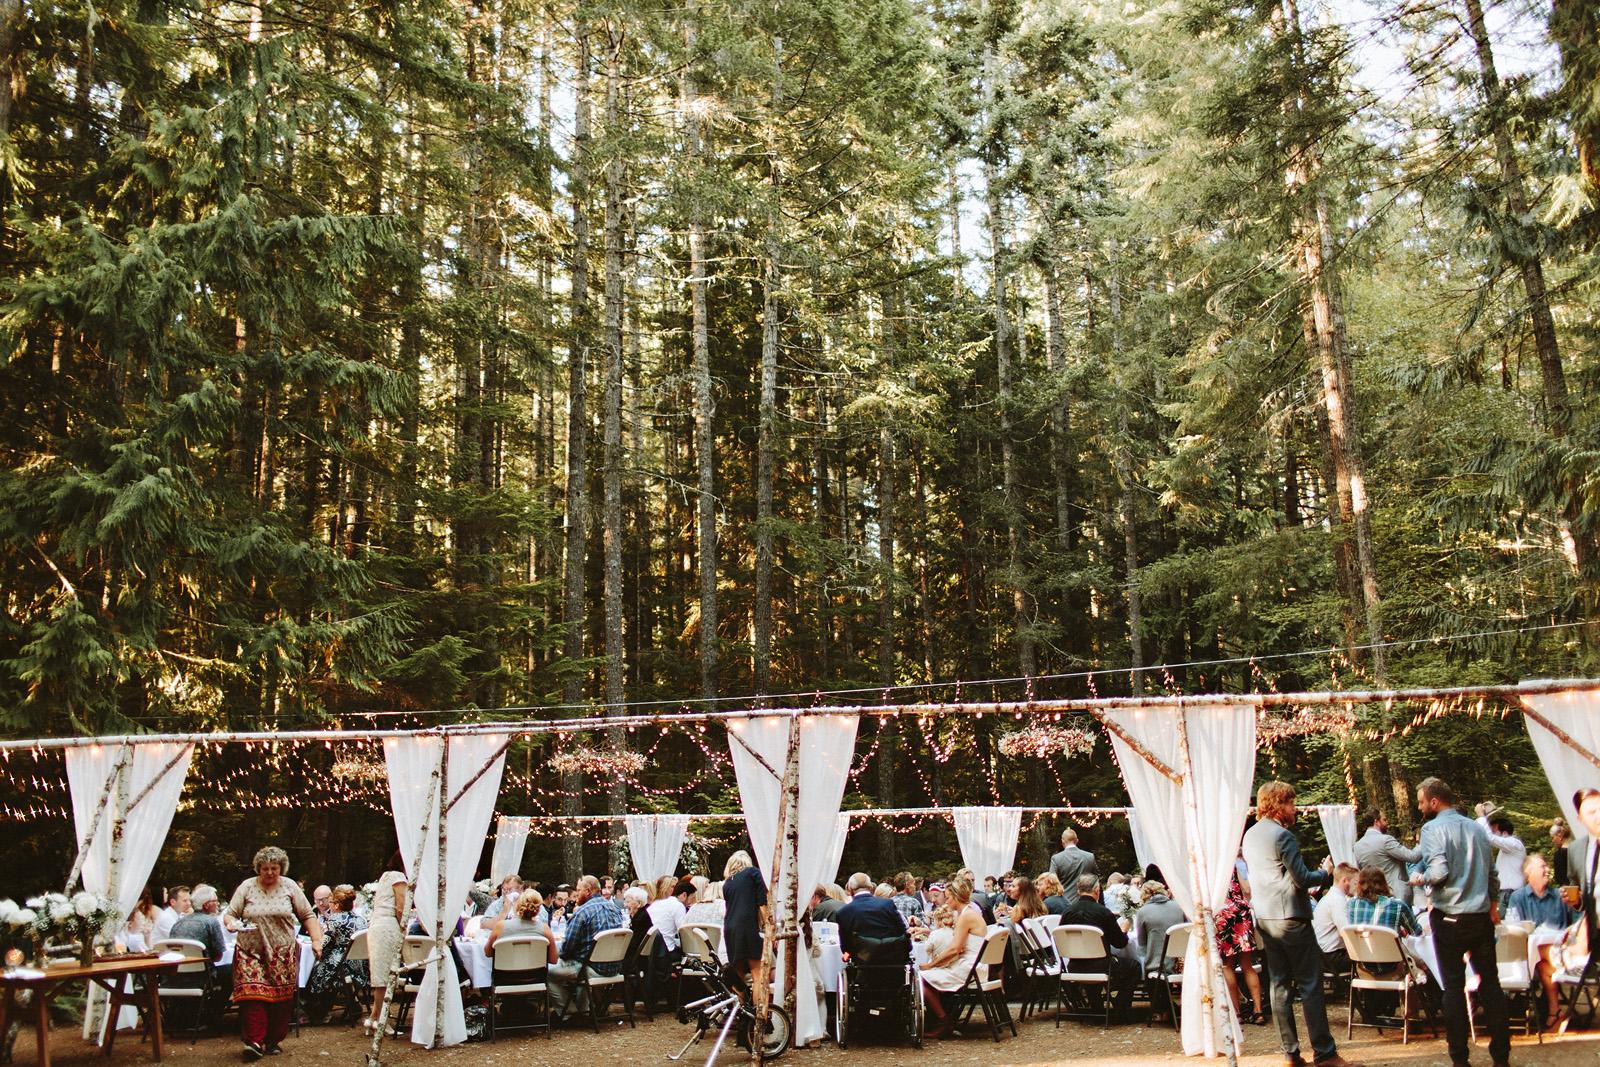 bethany-cory-076 LAKE CUSHMAN CAMPING WEDDING